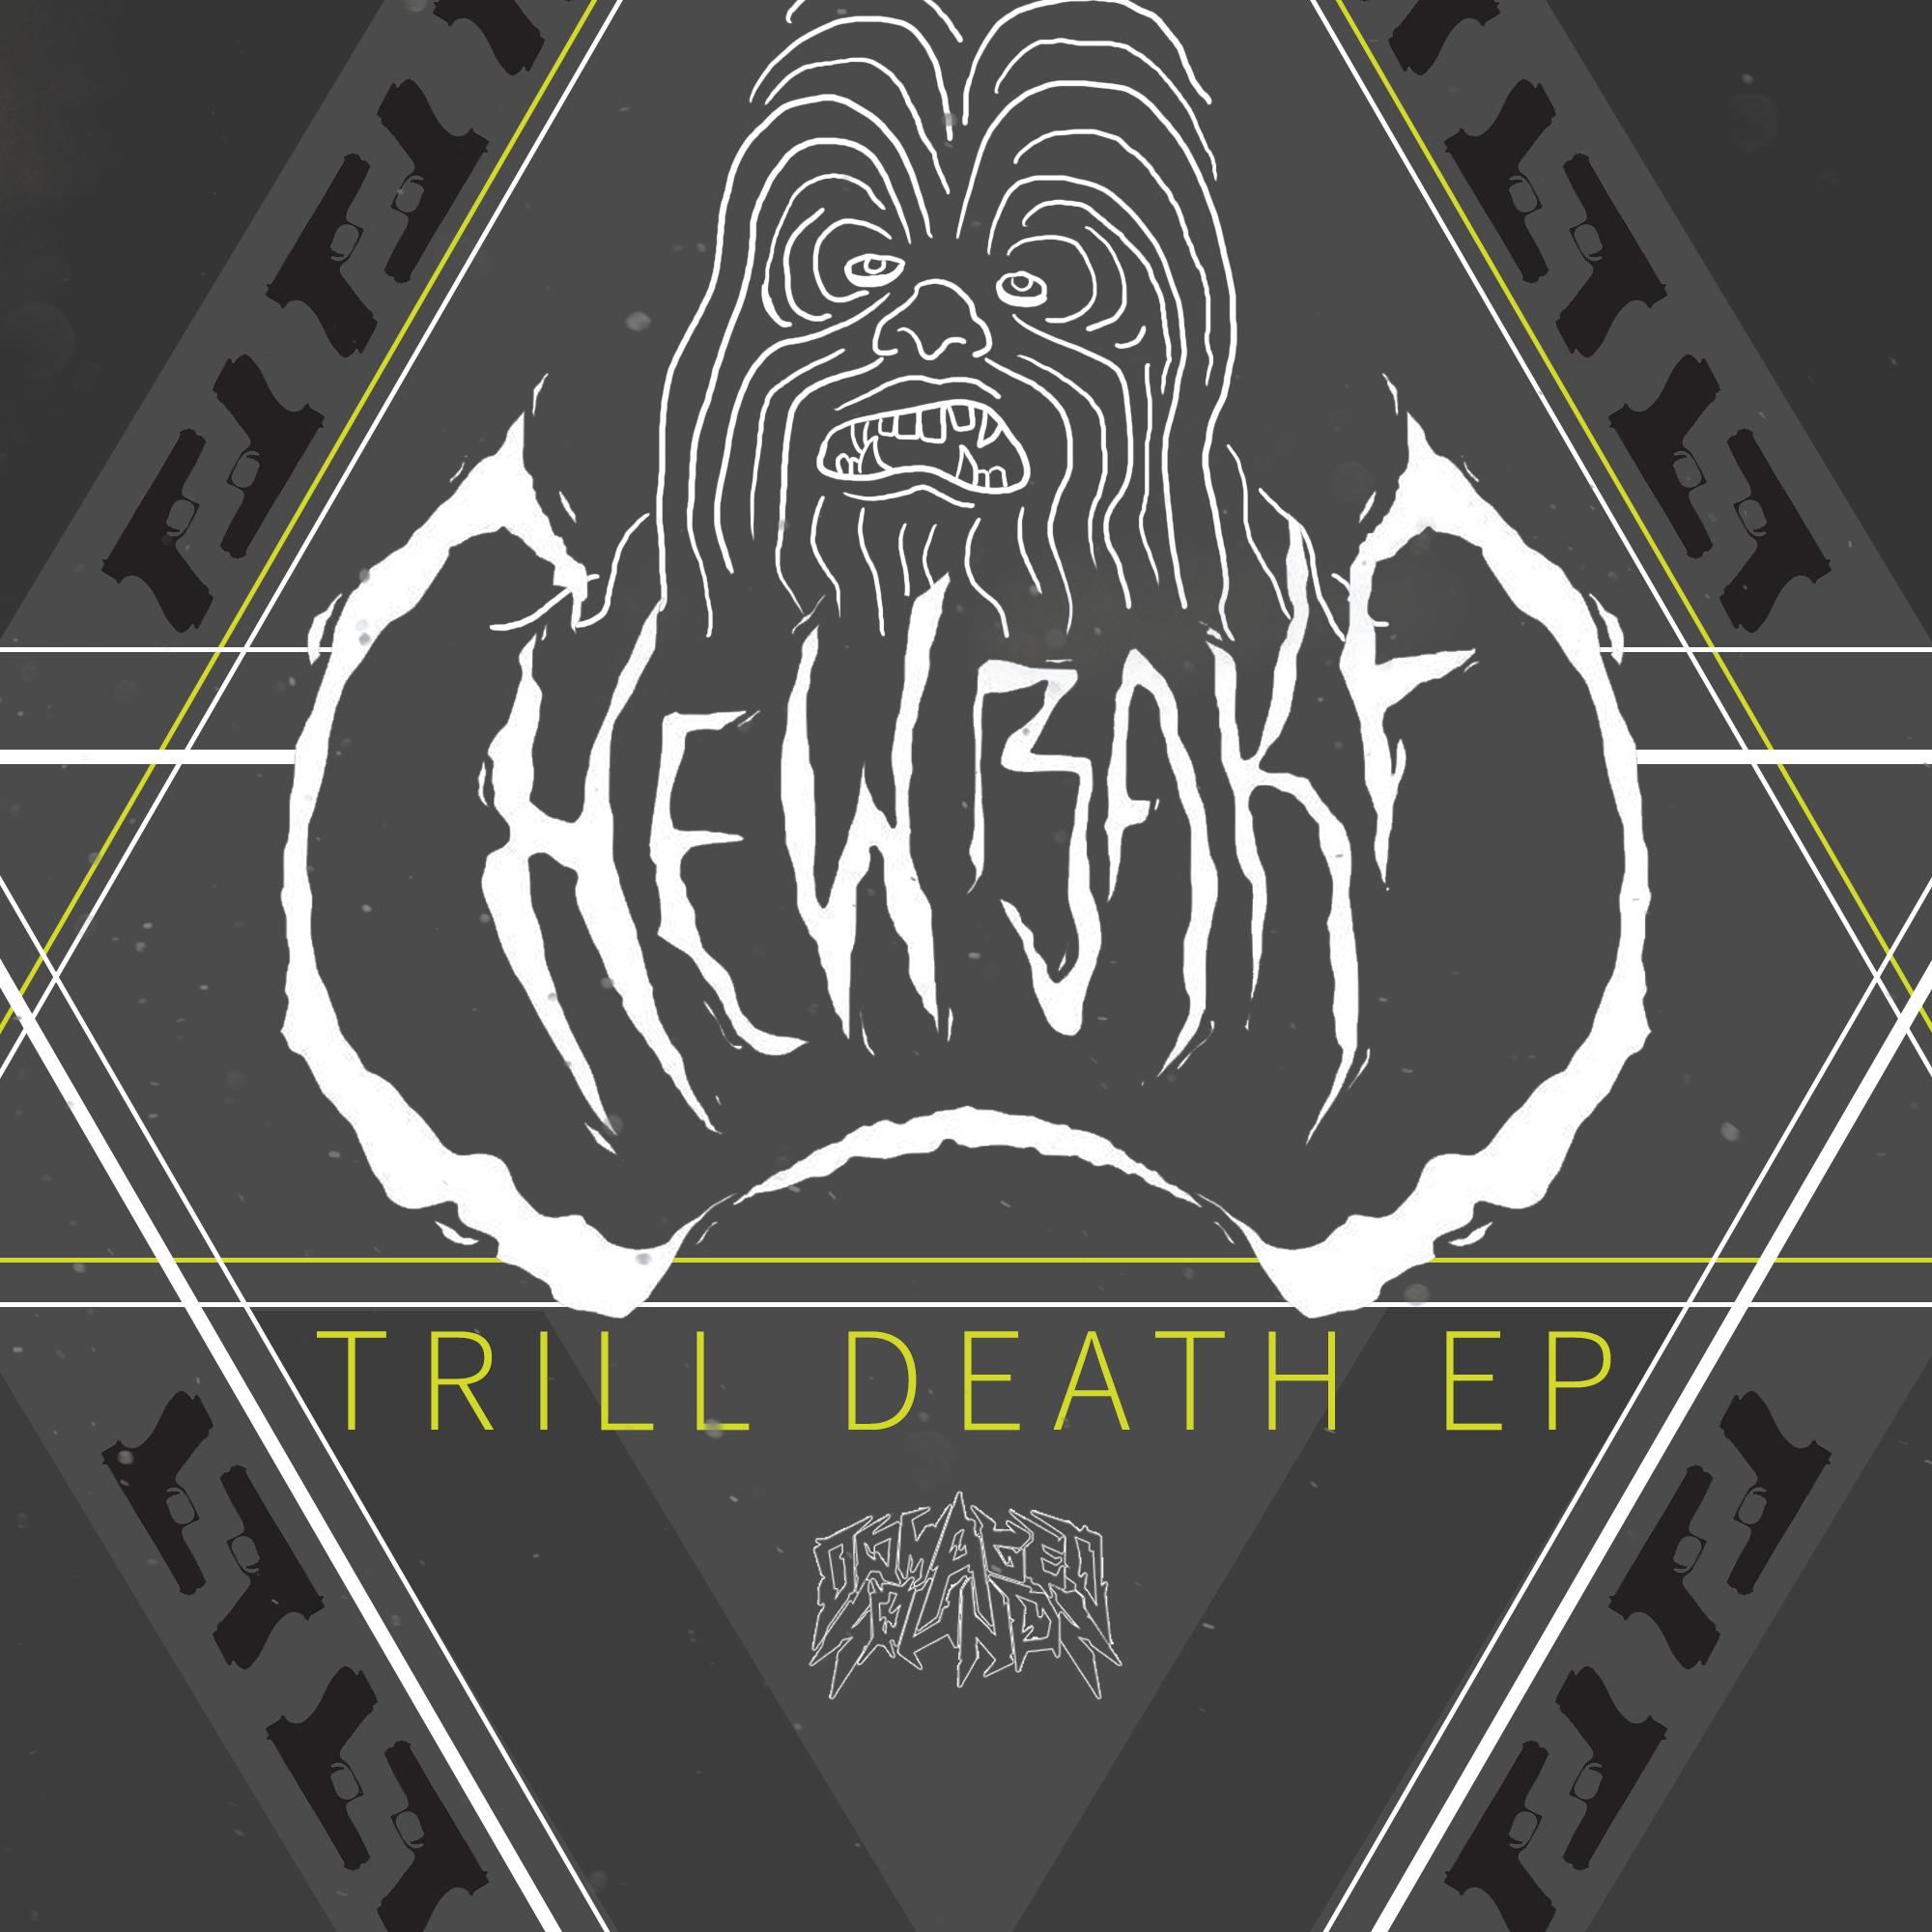 Chewbaka - Trill Death EP